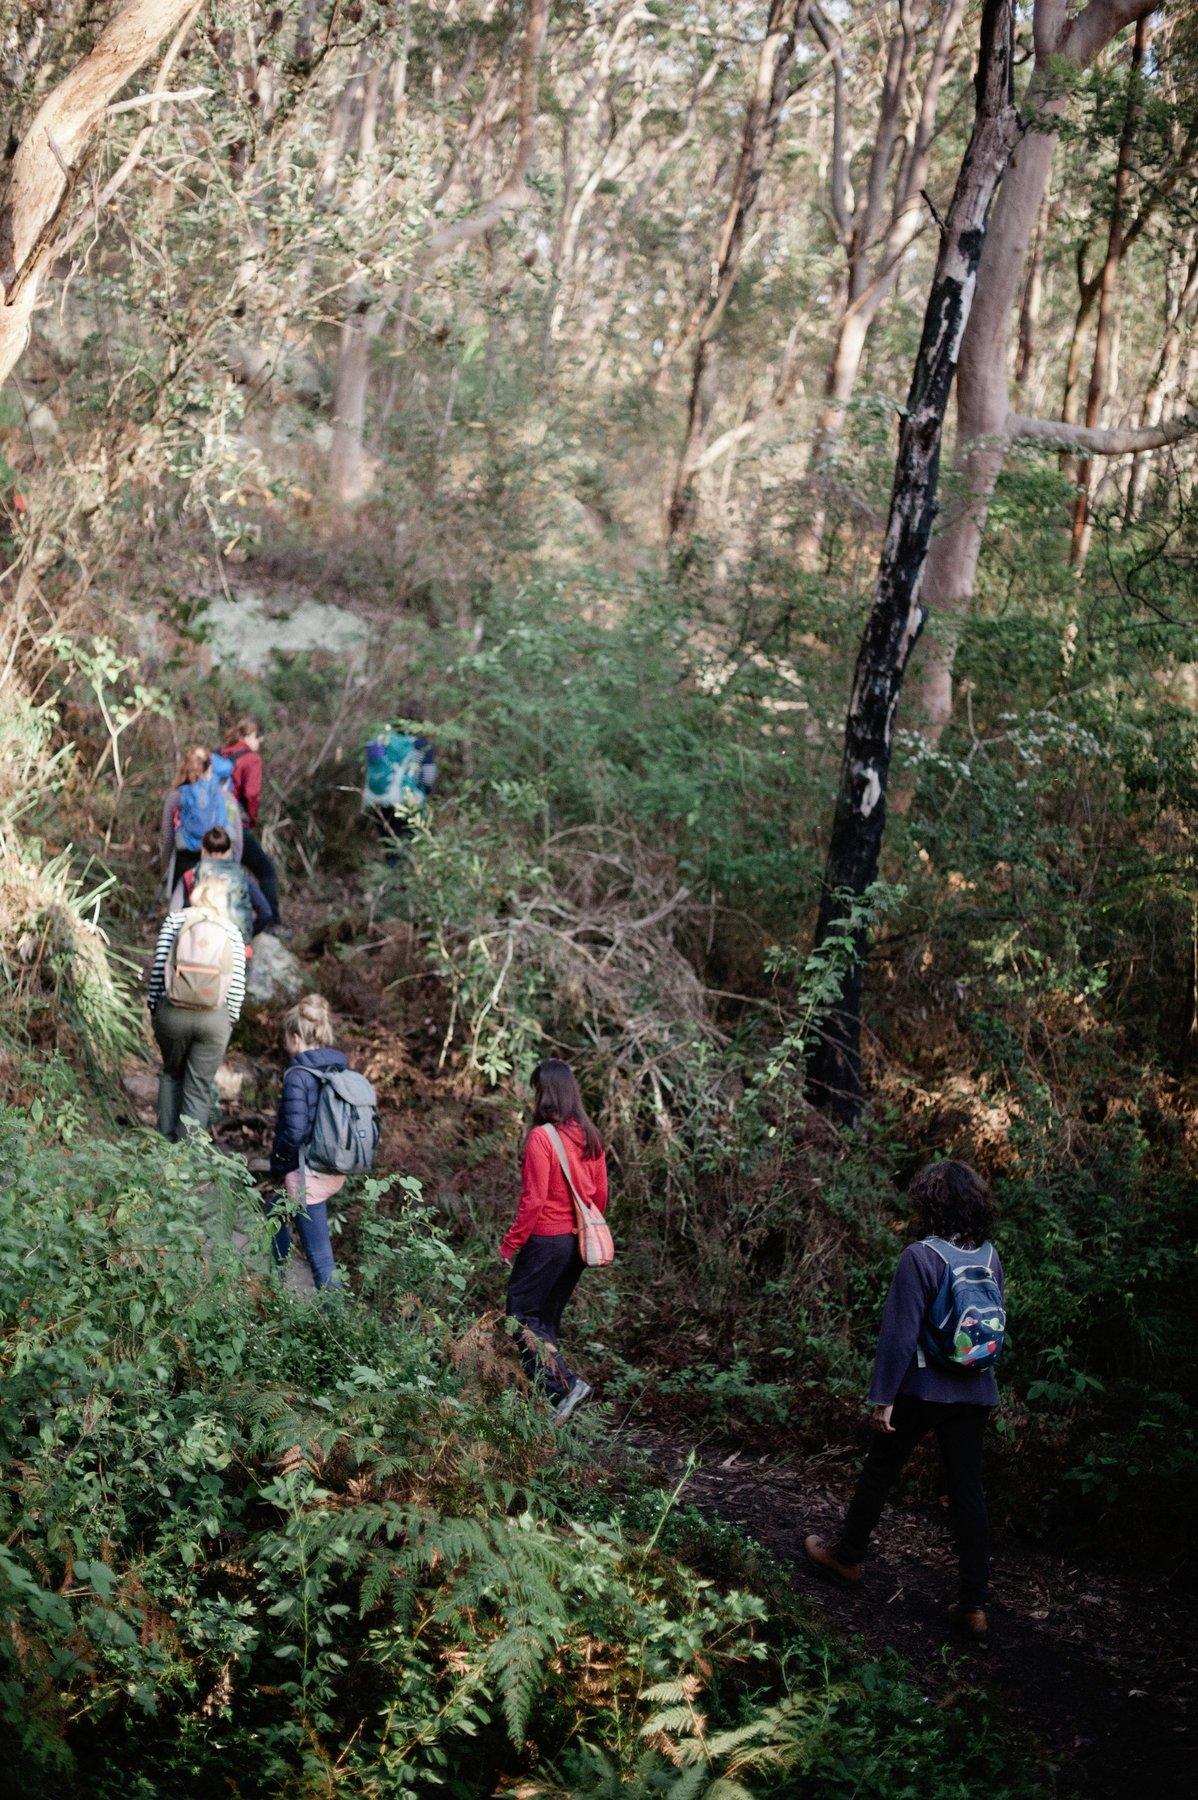 barefoot wellbeing - sydney australia - nature connect - mindfulness - movement - yoga - nature walksLouise Kiddell - FoM041.jpg